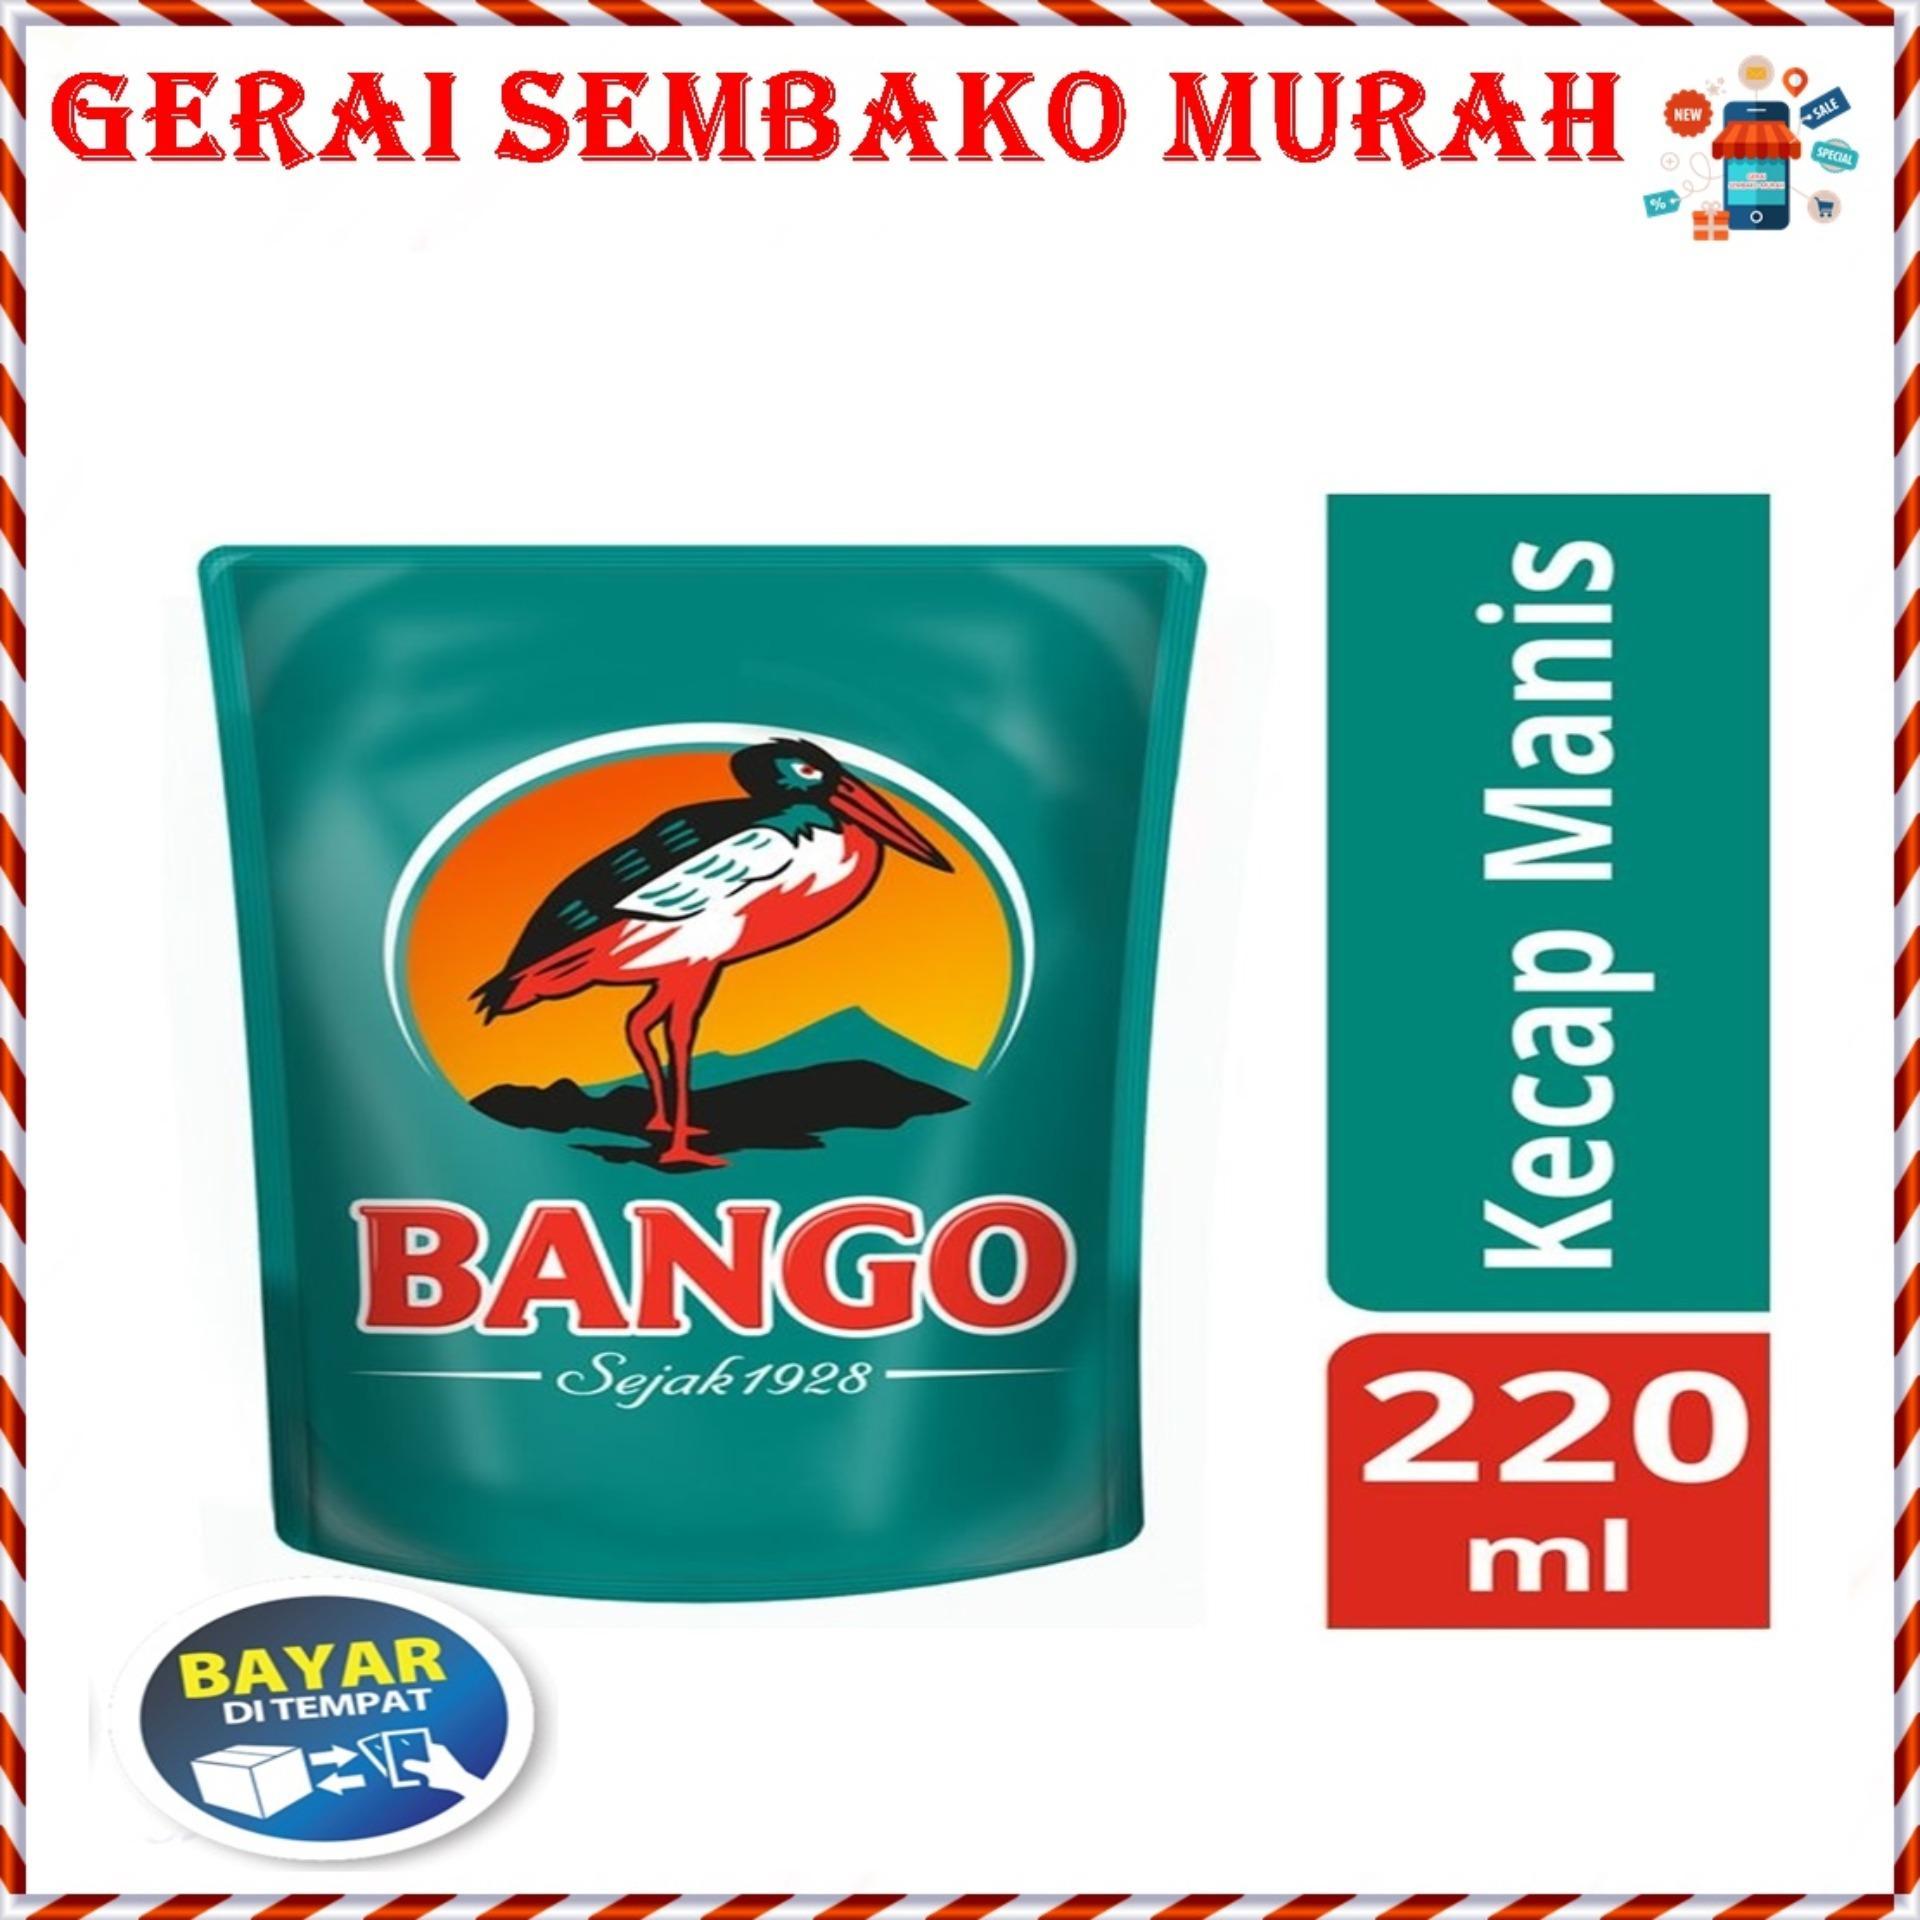 BANGO KECAP MANIS REFILL 220ML - BANGO KECAP MANIS - KECAP MANIS BANGO - GERAI SEMBAKO MURAH